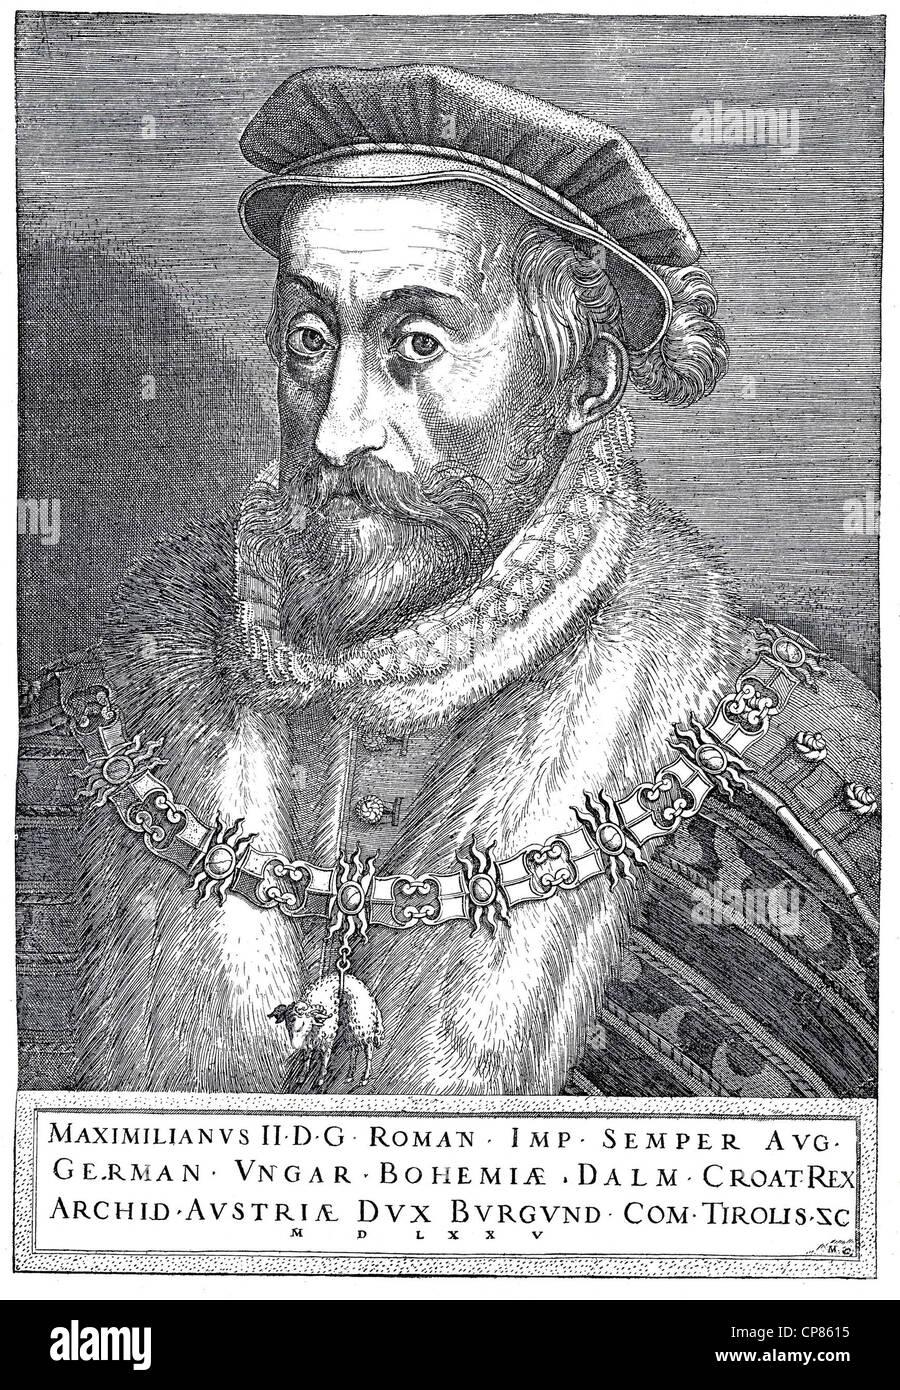 Emperor Maximilian II, 1527 - 1576, copper engraving from 1575, Kaiser  Maximilian II